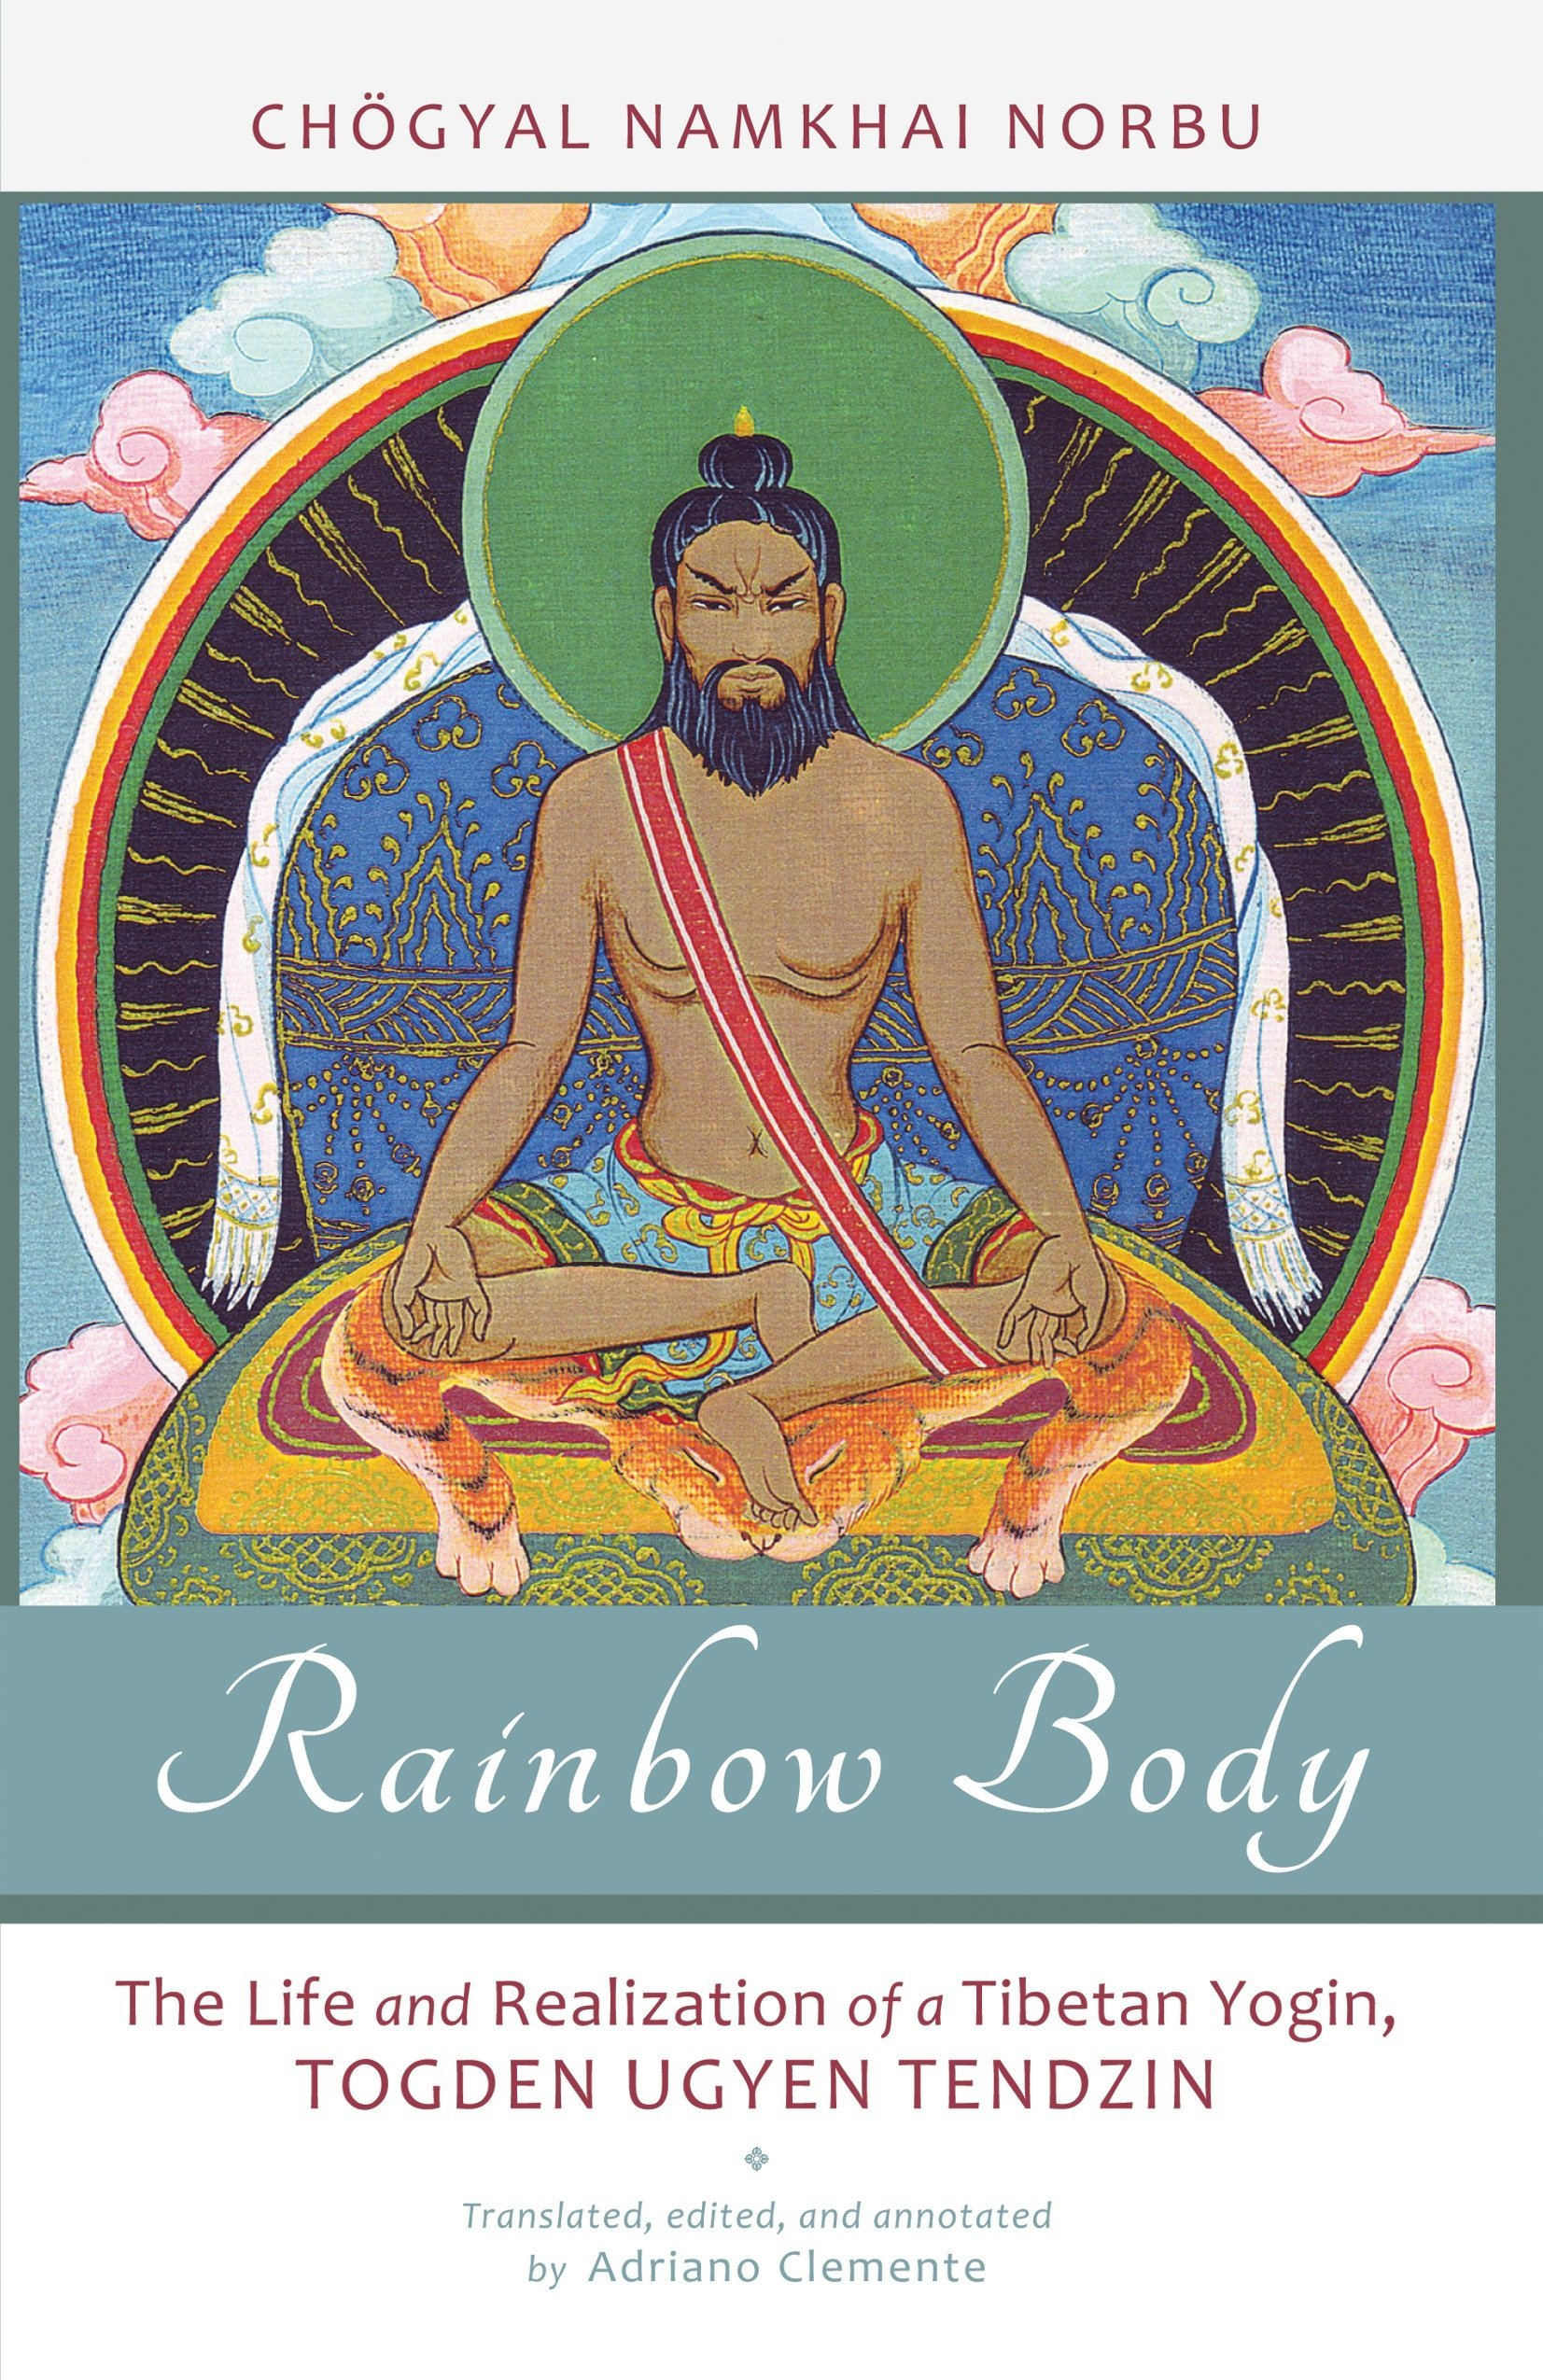 Rainbow Body: Amazon.es: Chogyal Namkhai Norbu: Libros en ...